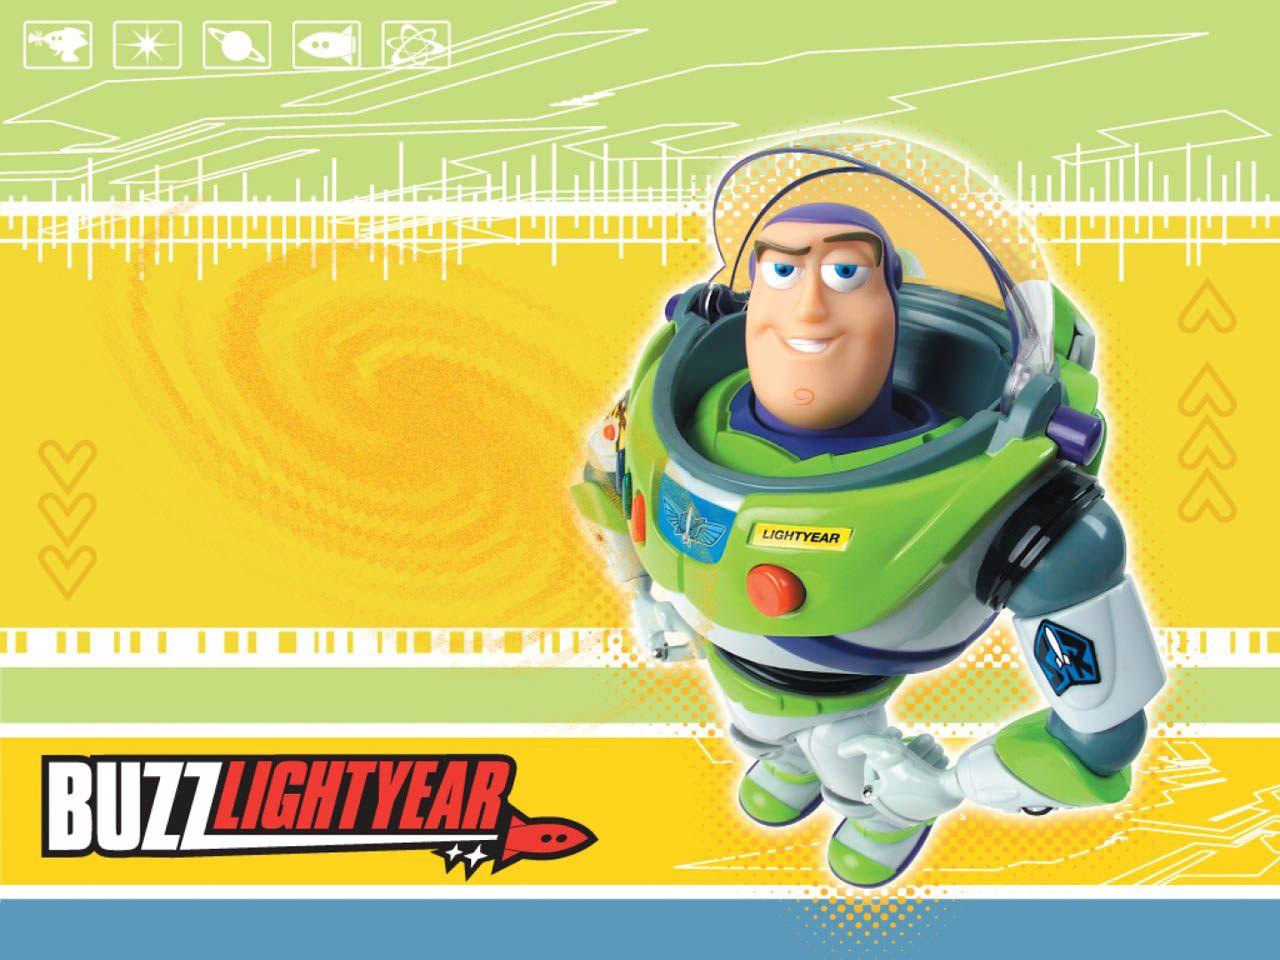 Buzz Lightyear Standing Portrait Wallpaper 1280x960